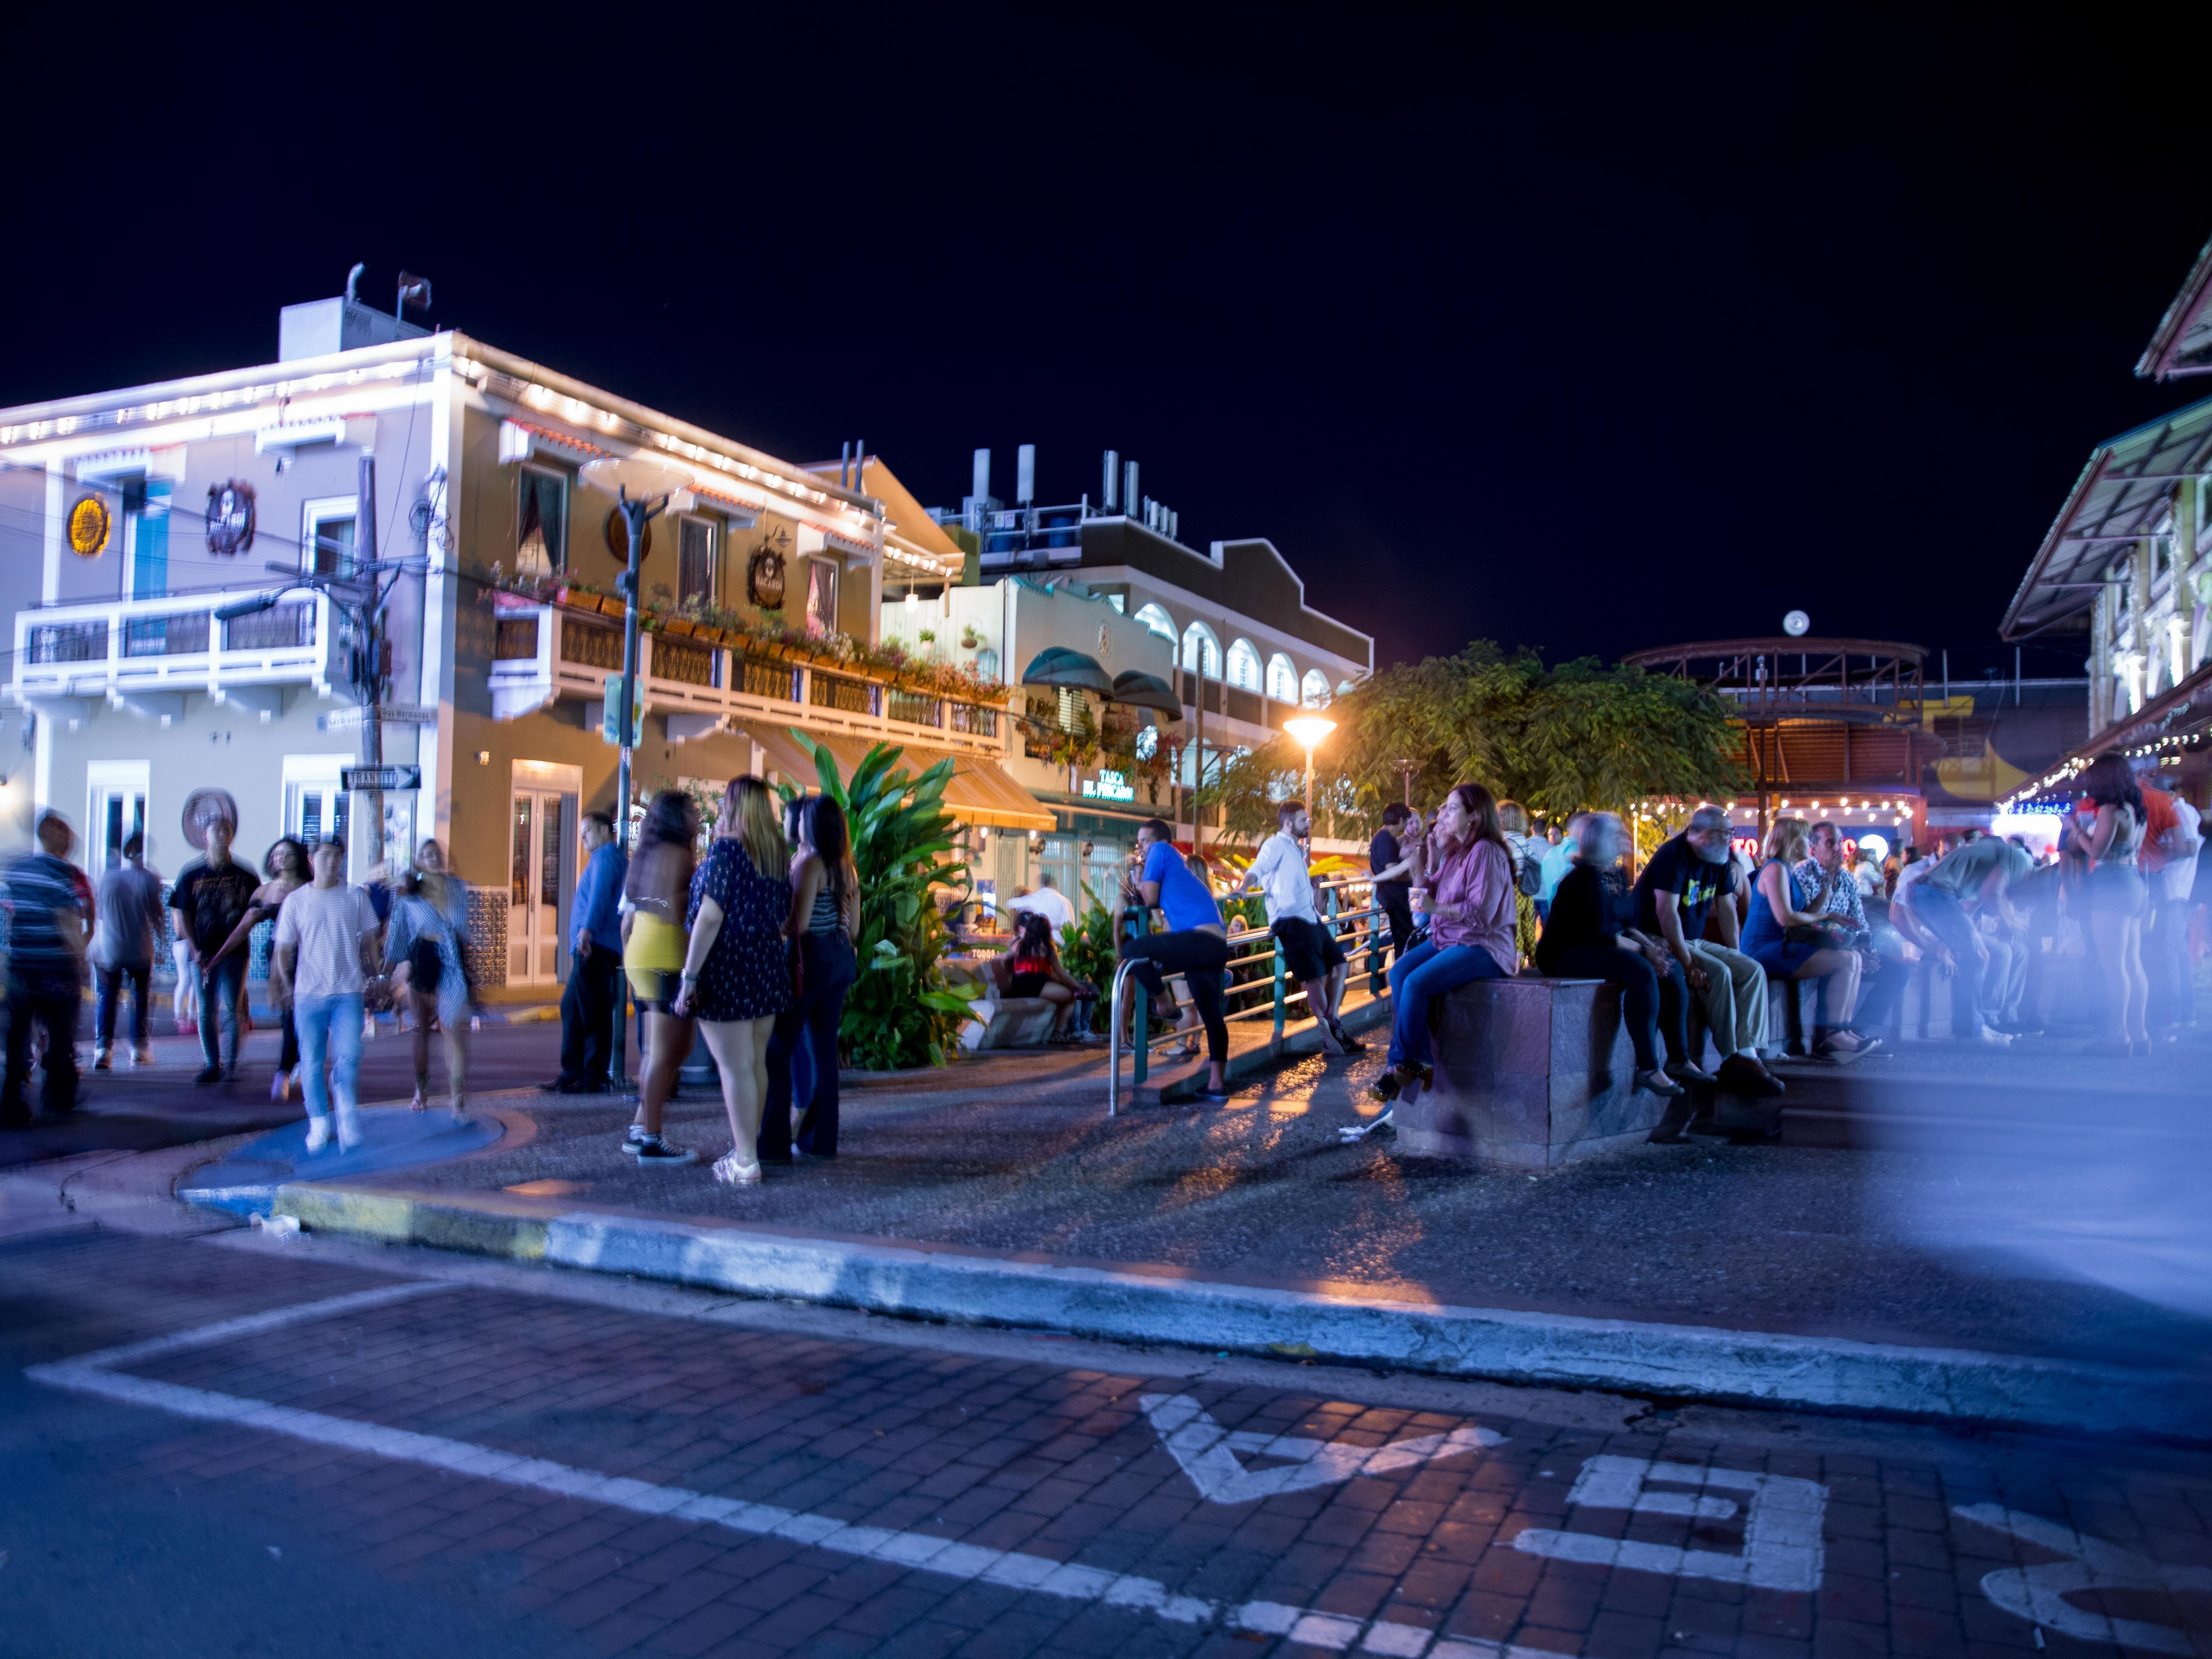 Streets or Old San Juan